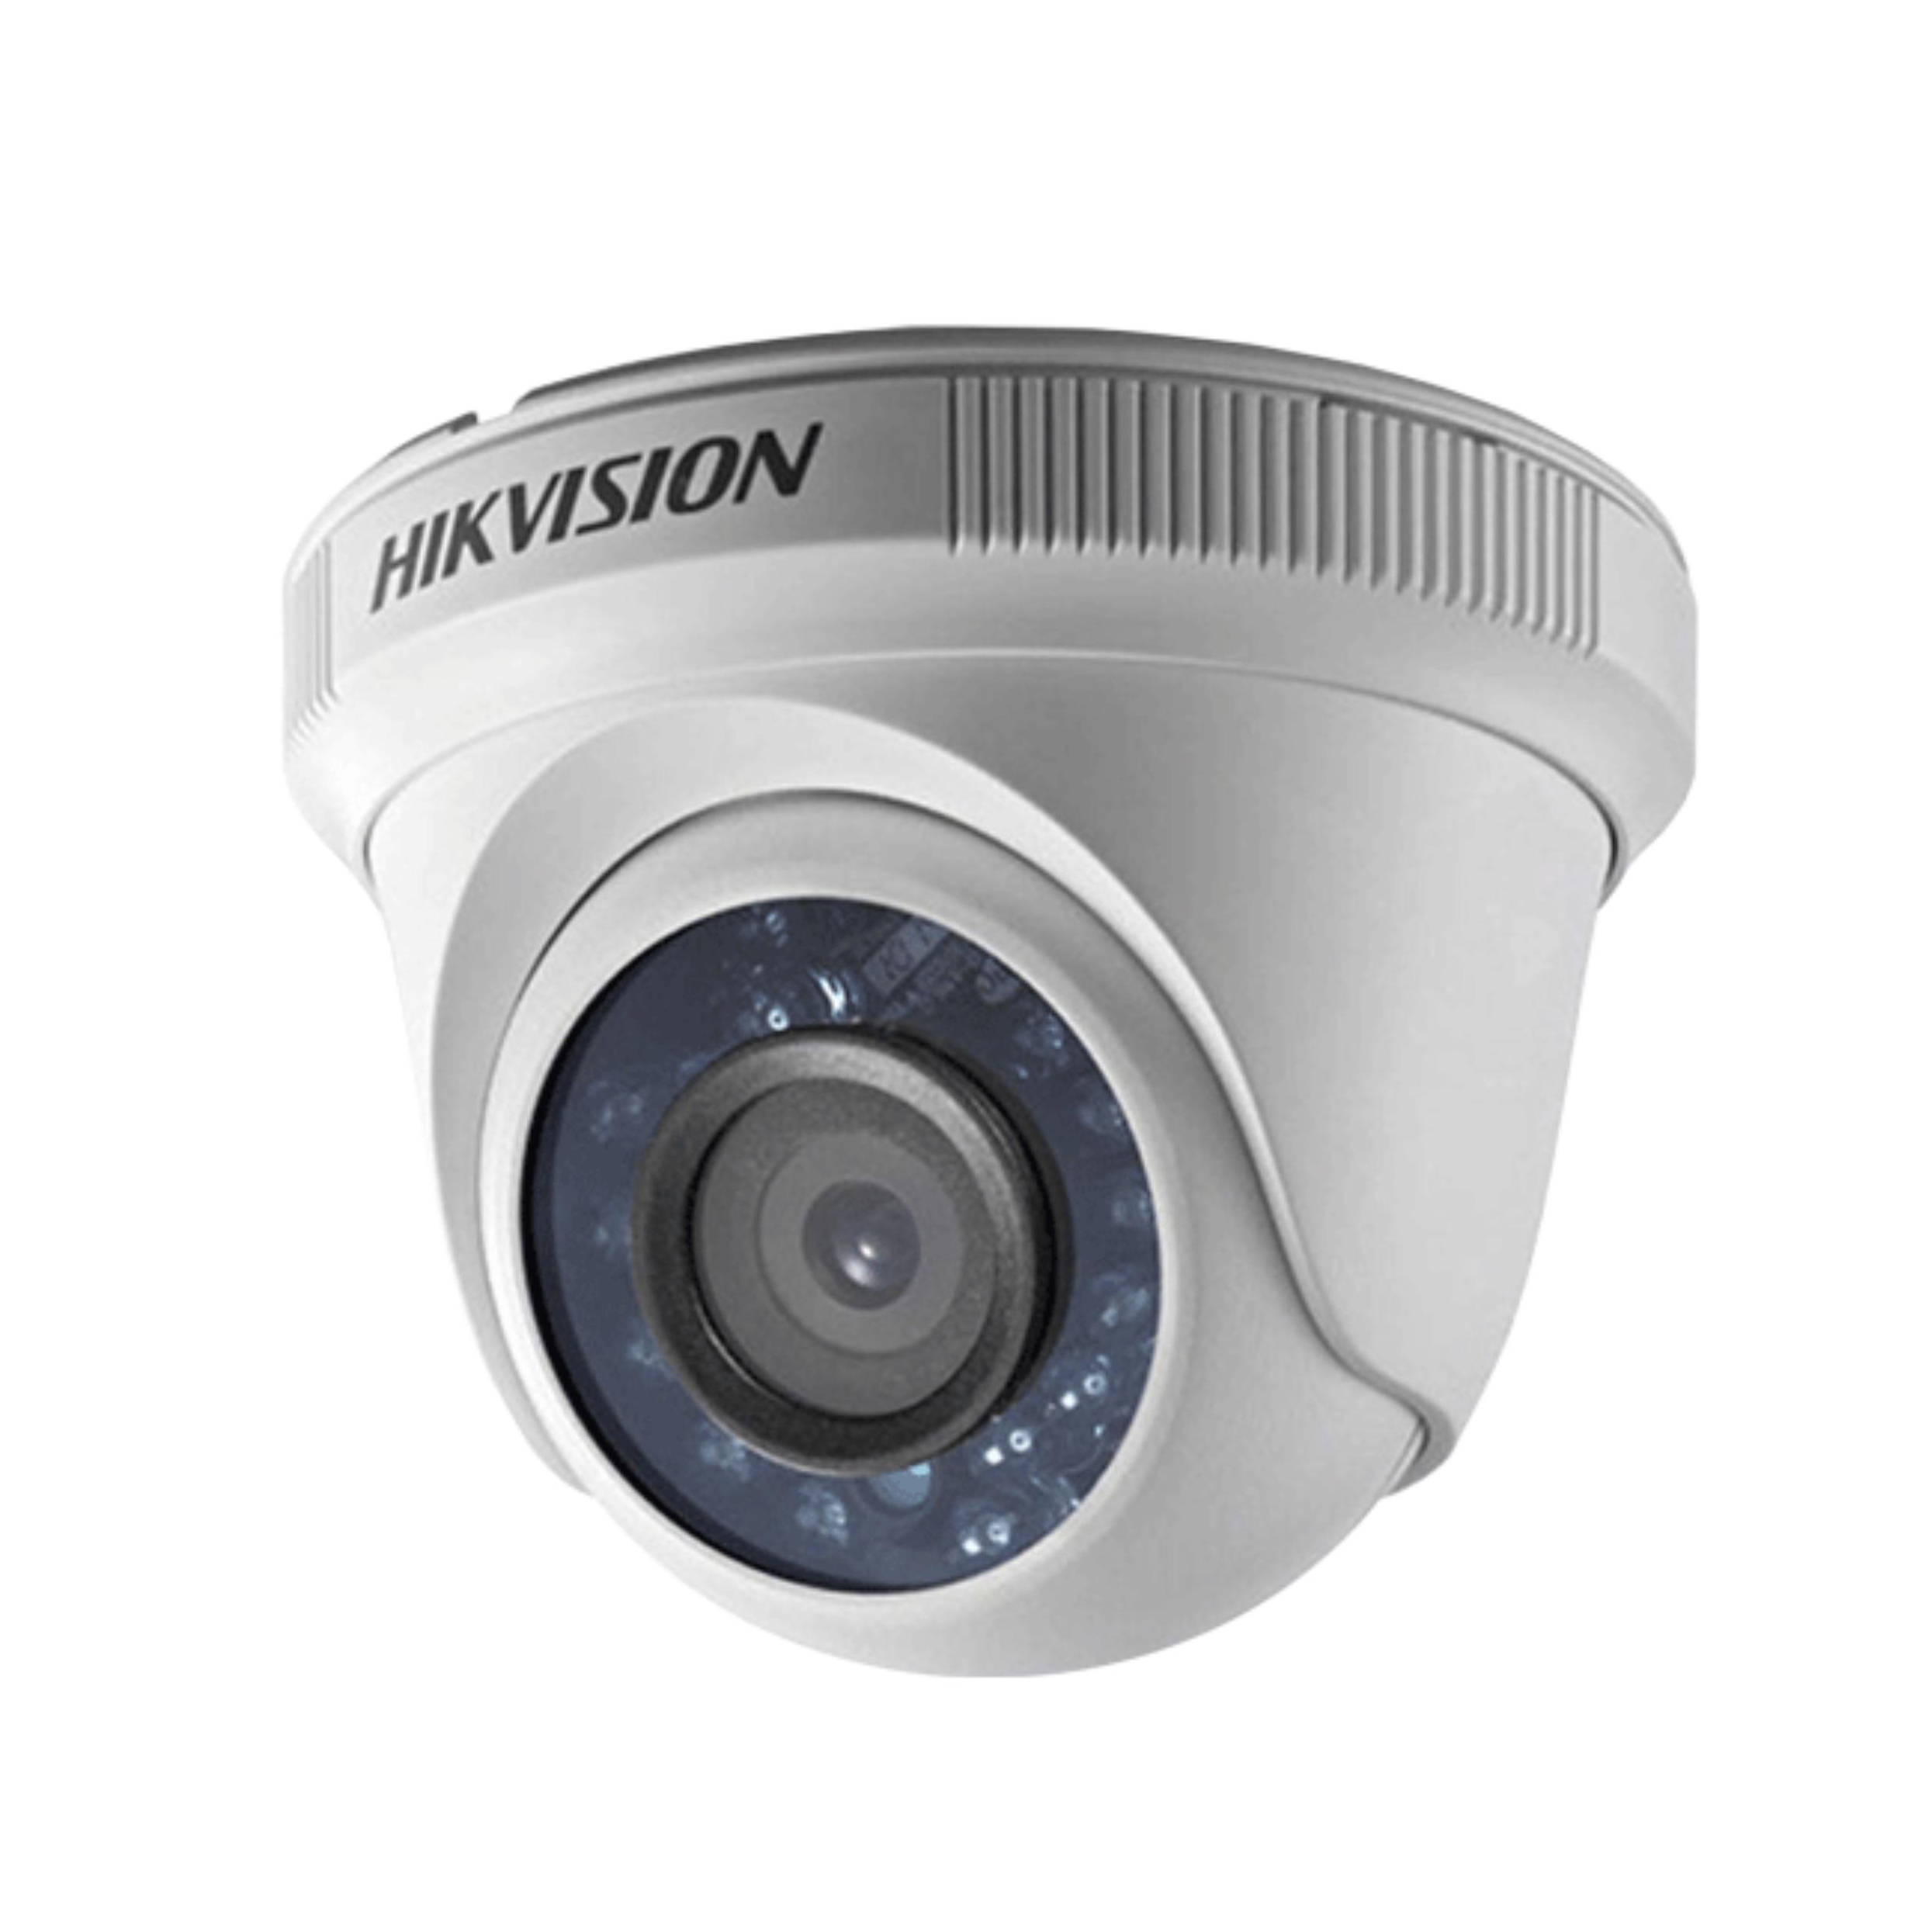 Camera HD-TVI bán cầu 1 MP Hikvision DS-2CE56C0T-IR